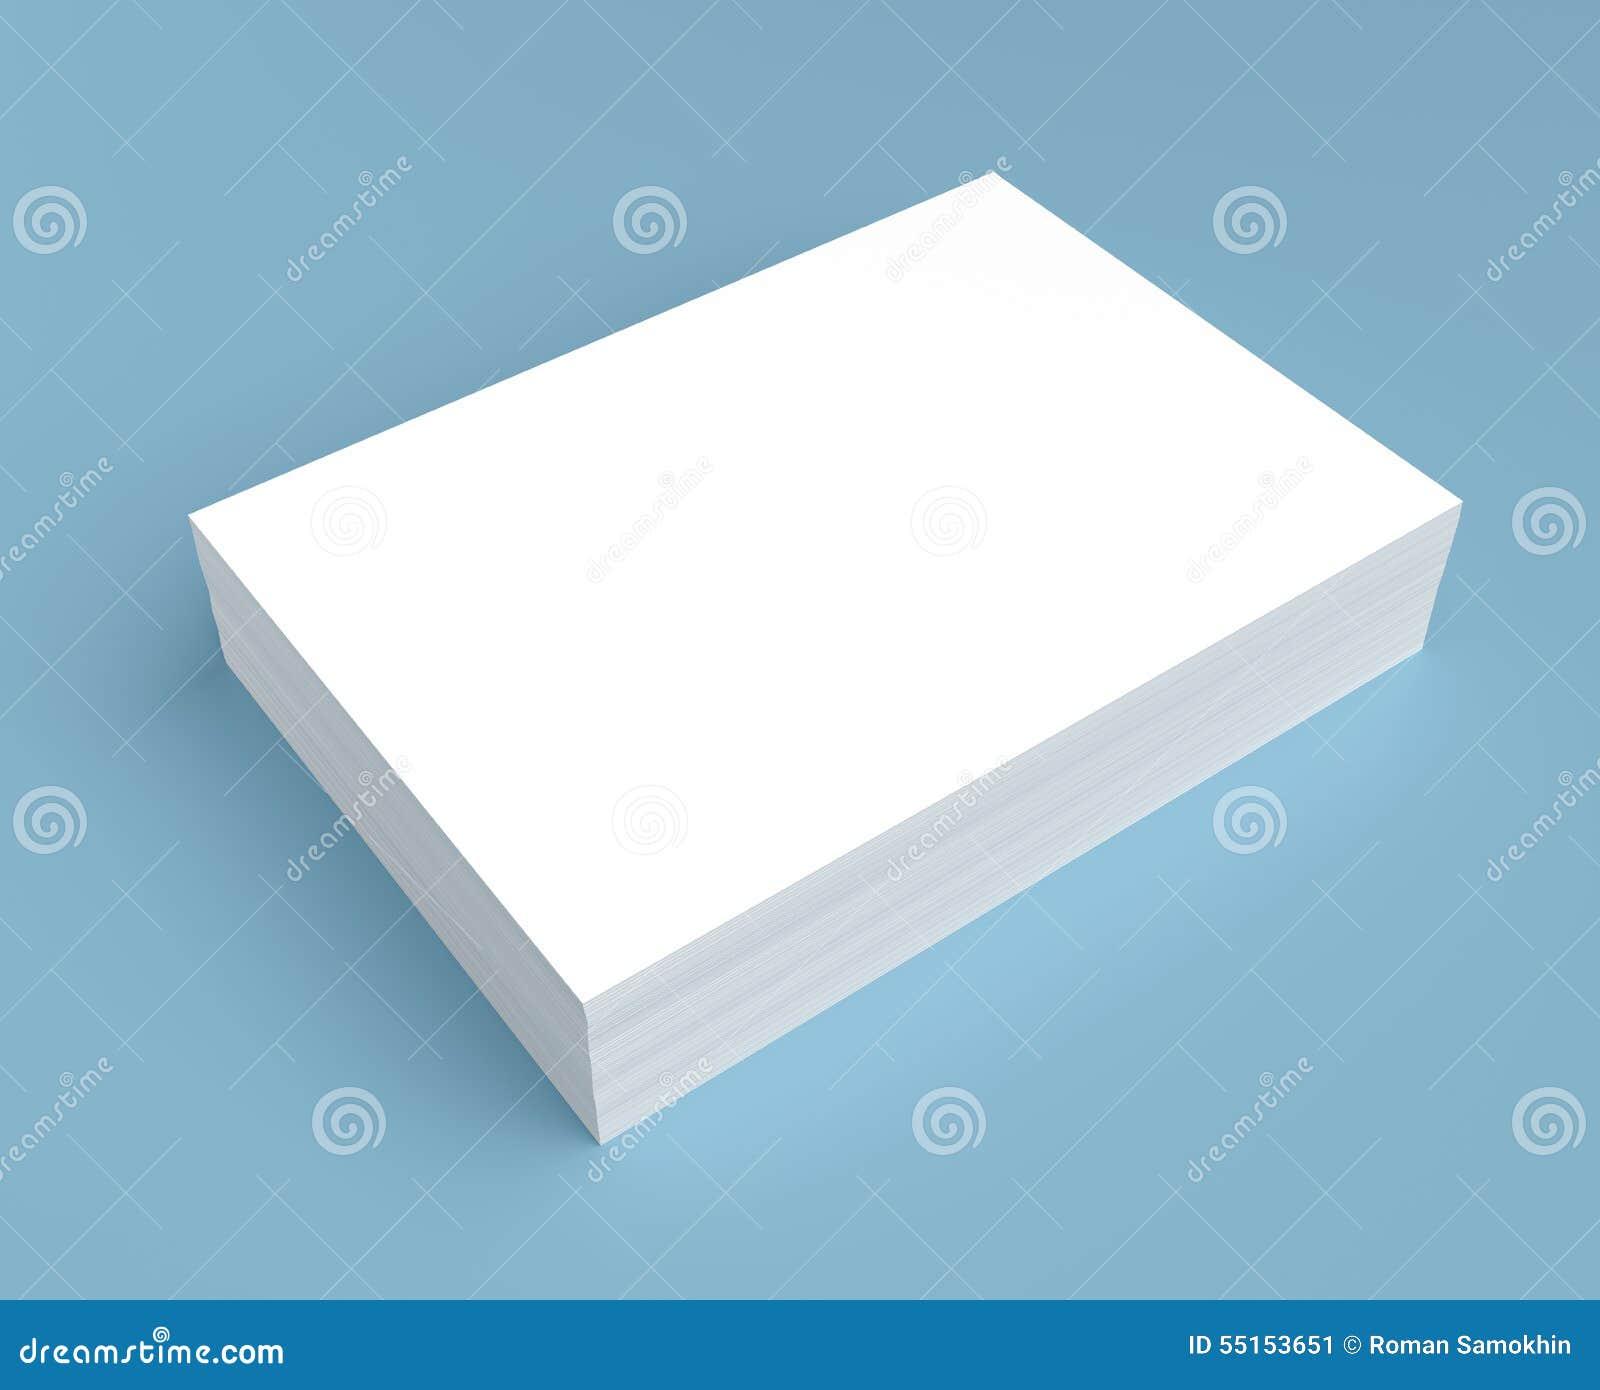 Heap of white paper